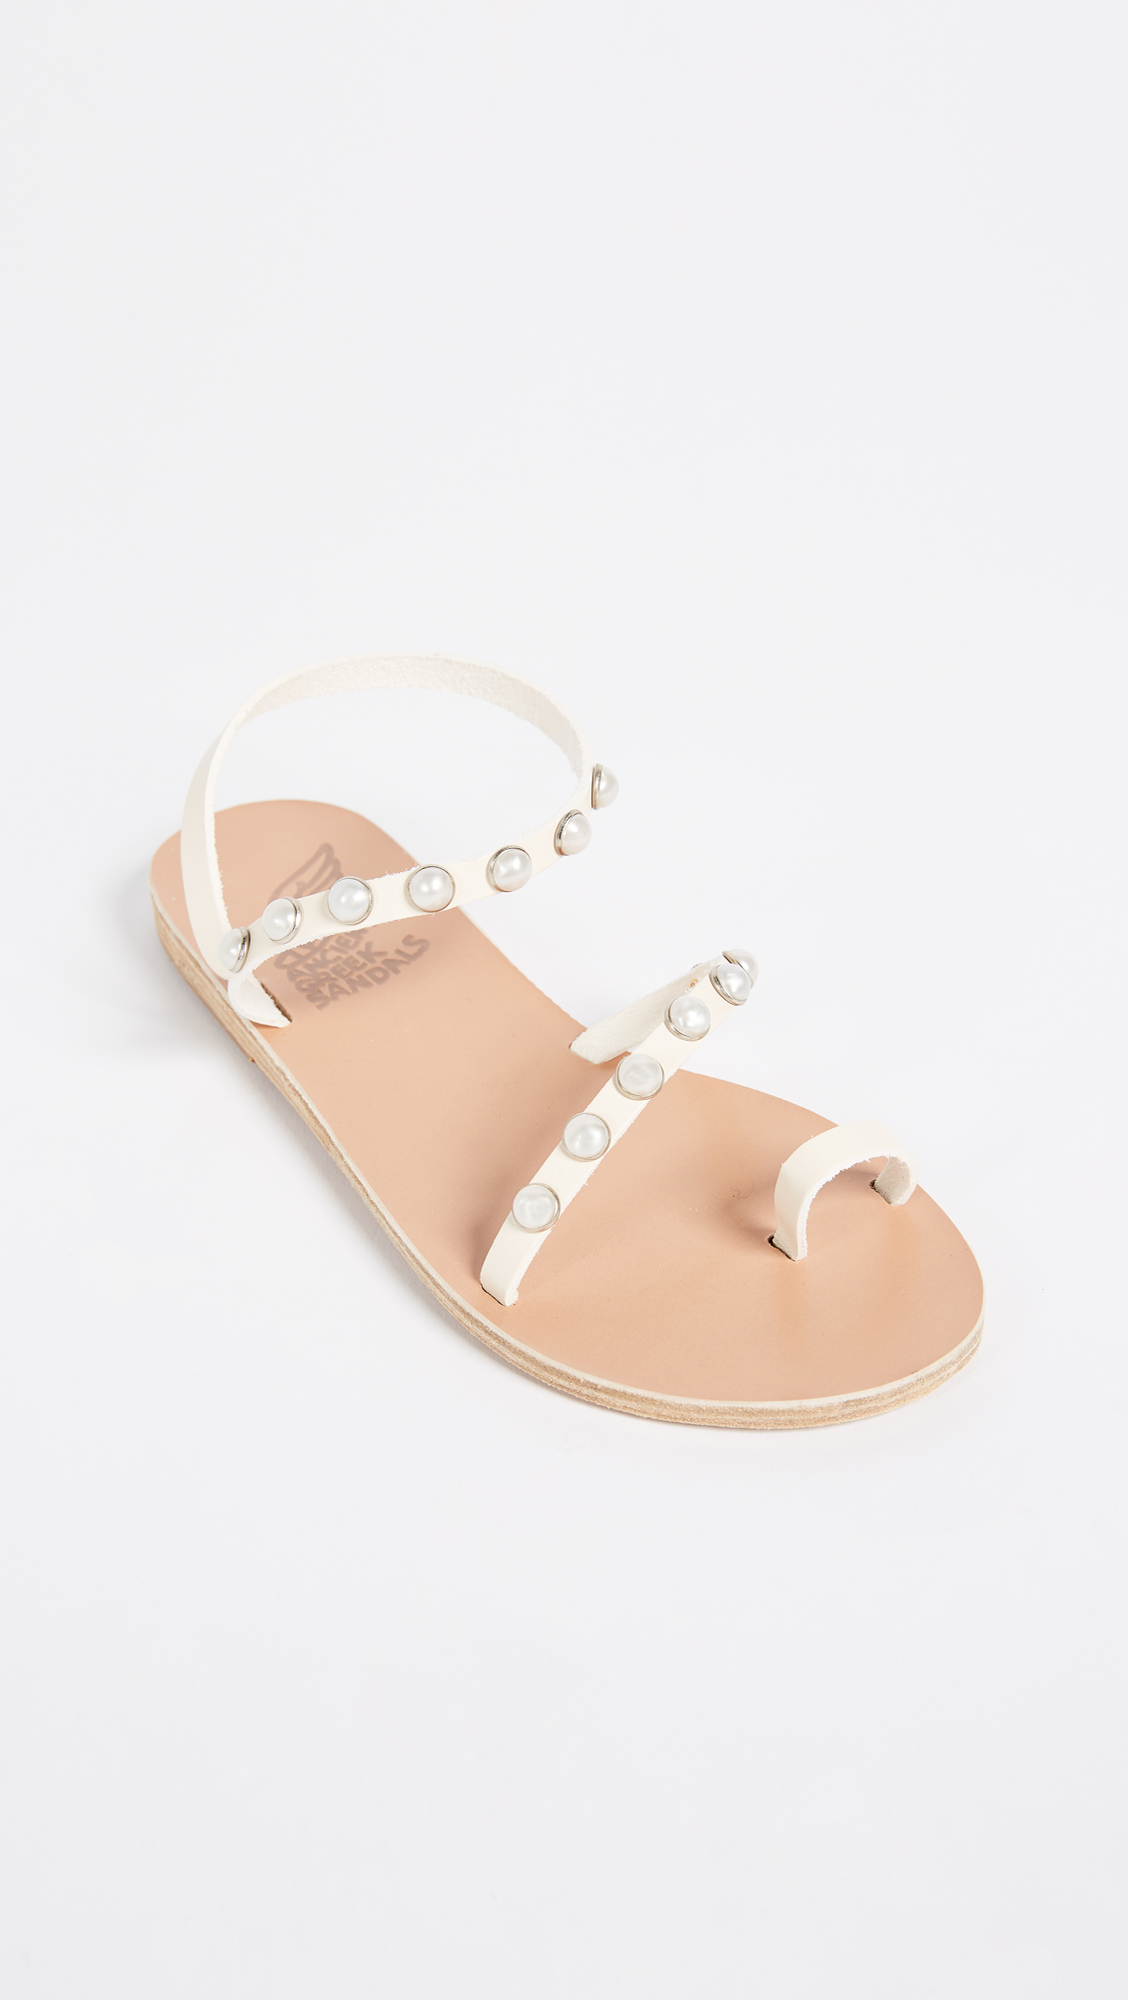 19274e730 Ancient Greek Sandals Apli Eleftheria Sandals